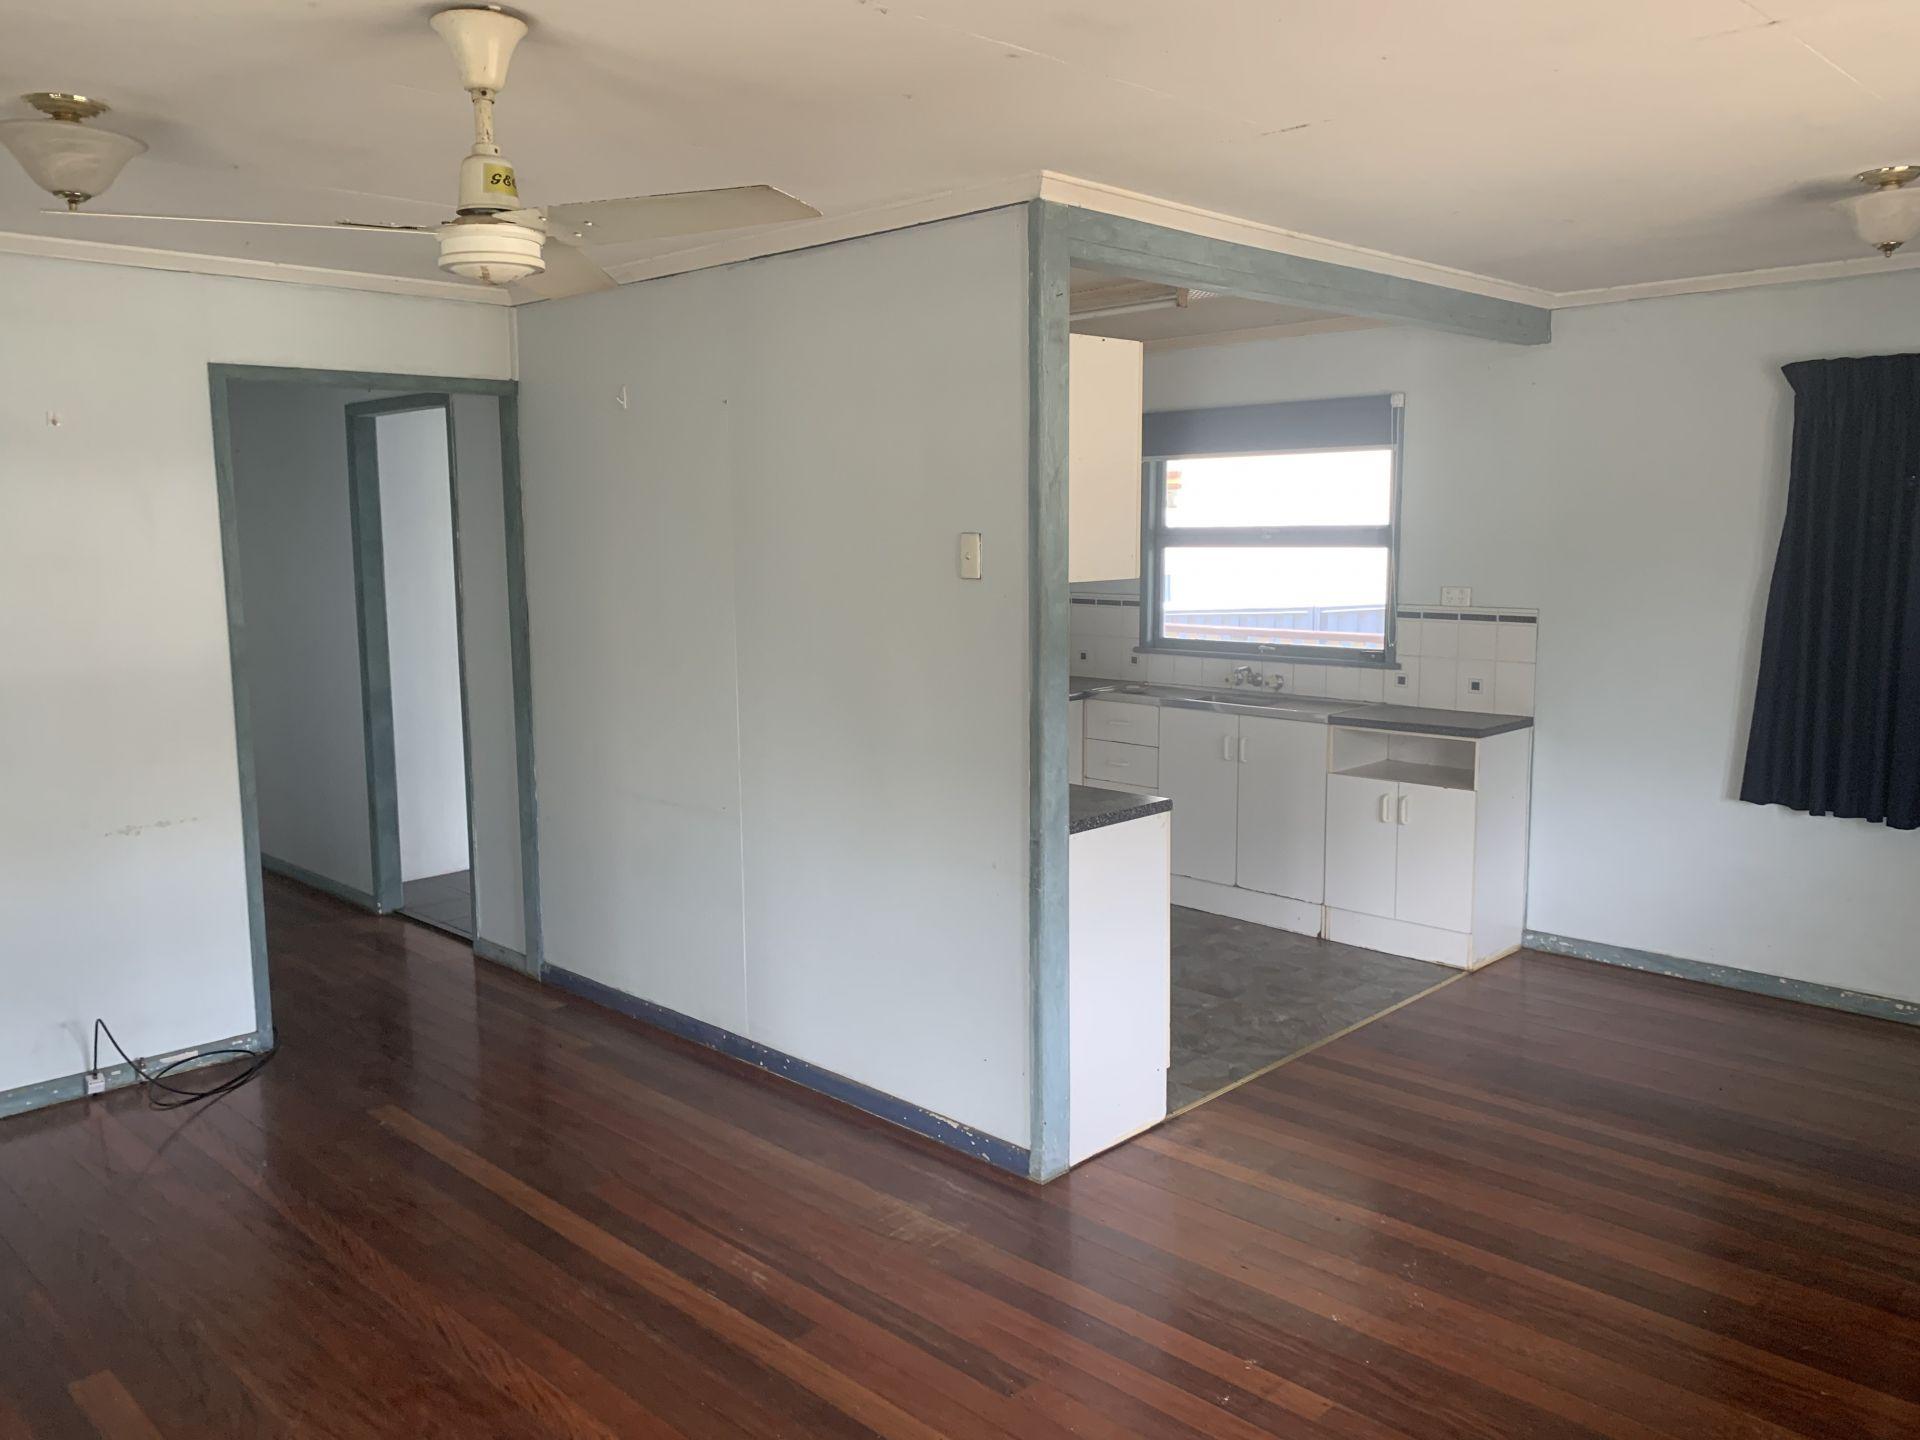 ACACIA RIDGE, QLD 4110